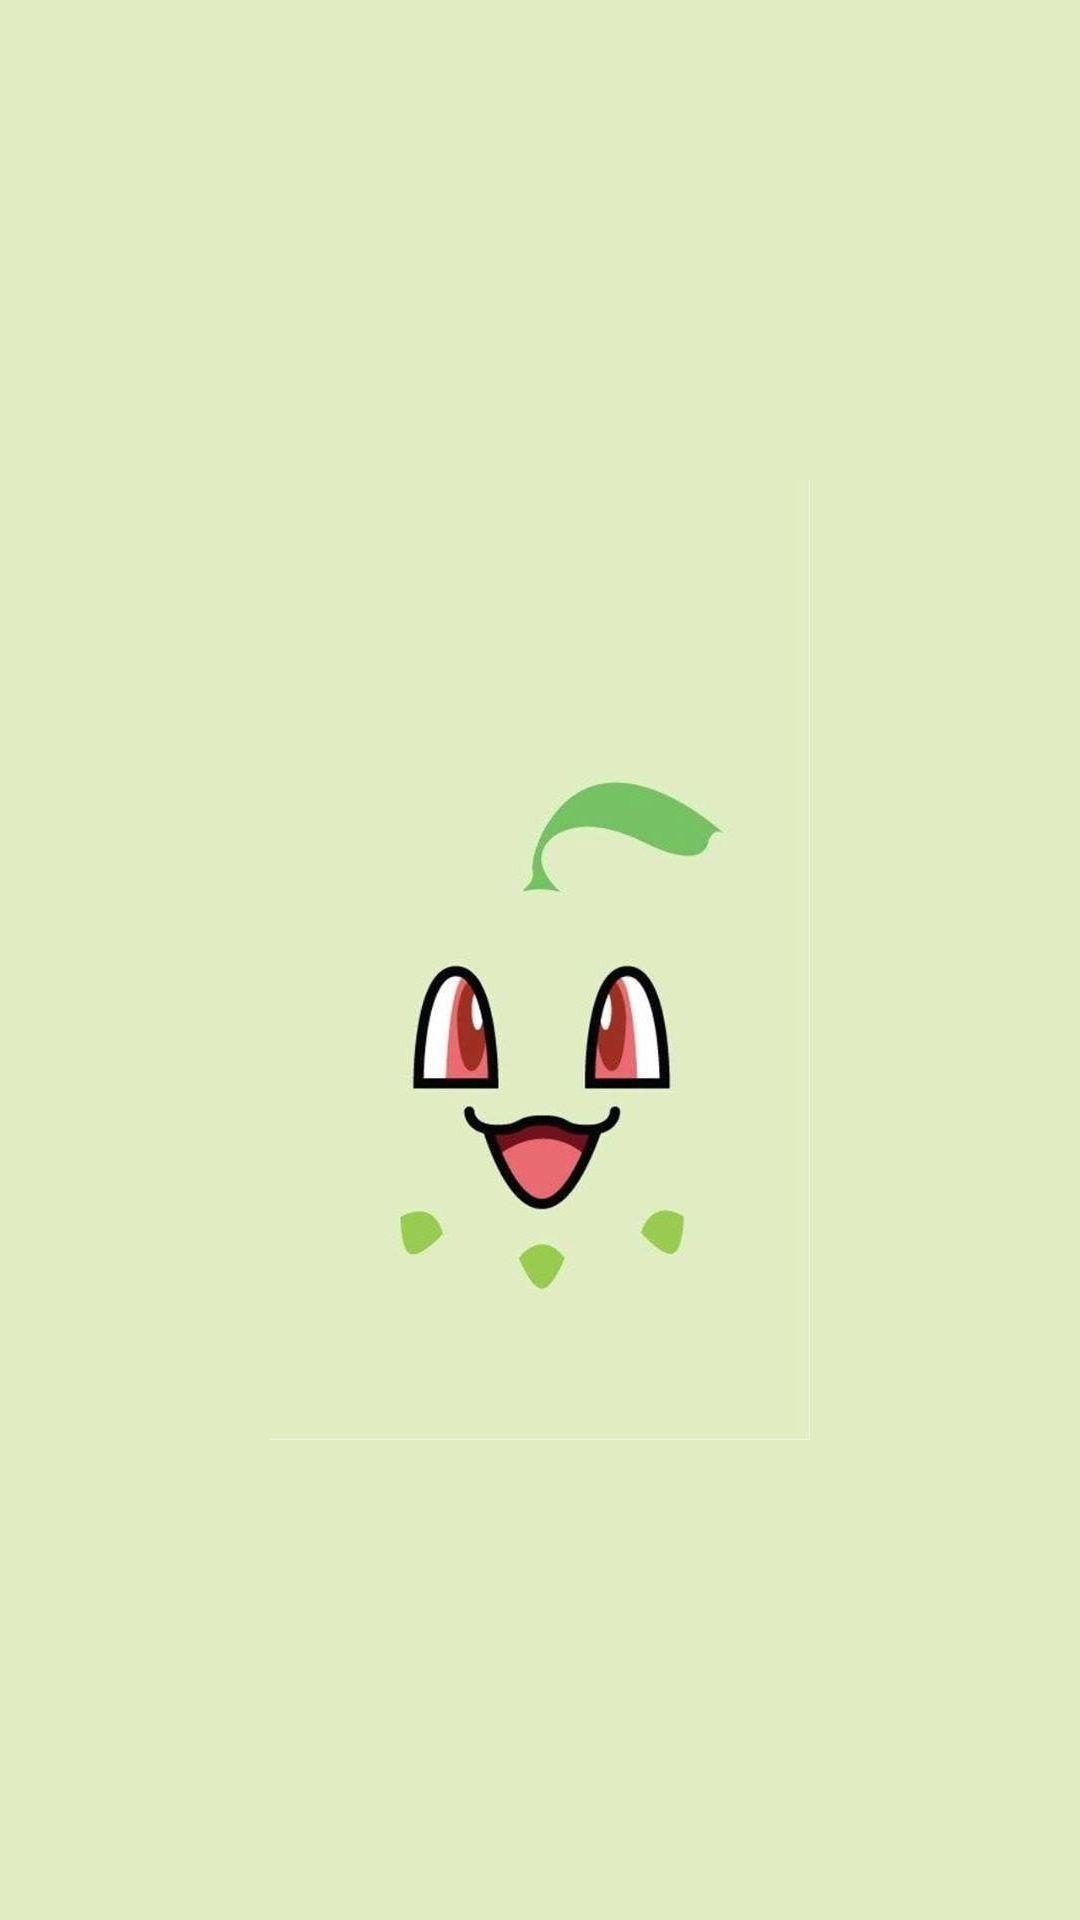 Pokemon Minimalist background wallpaper